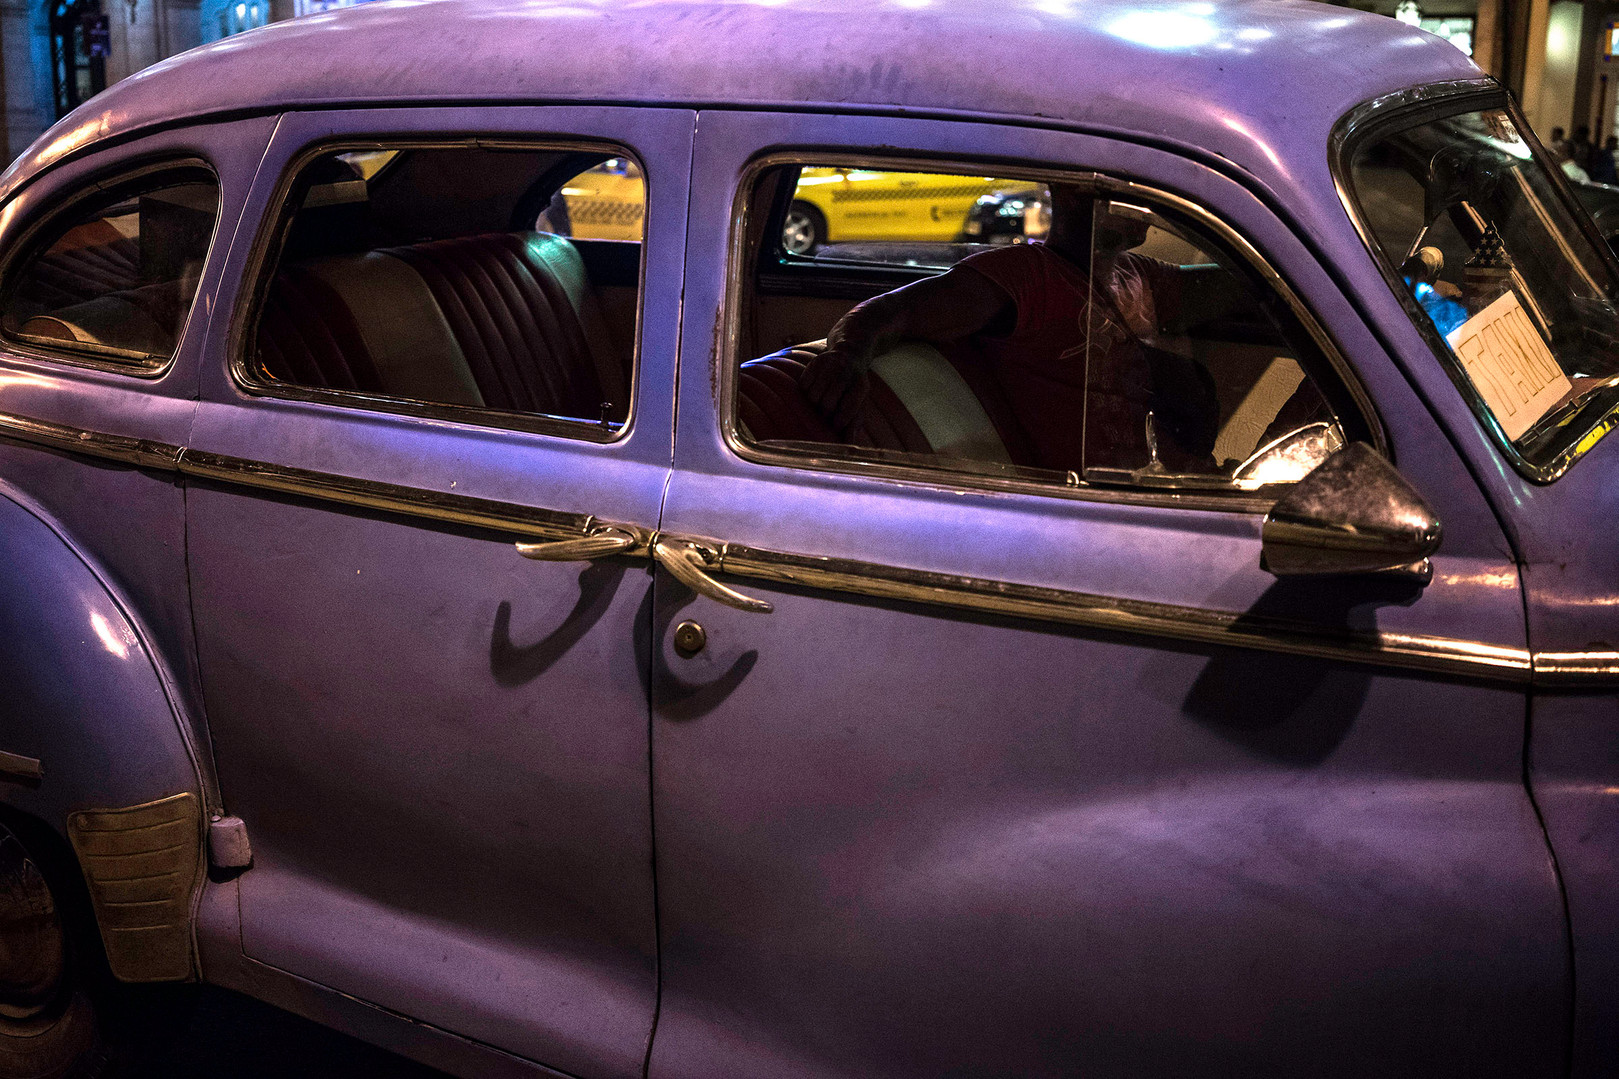 Violet taxi